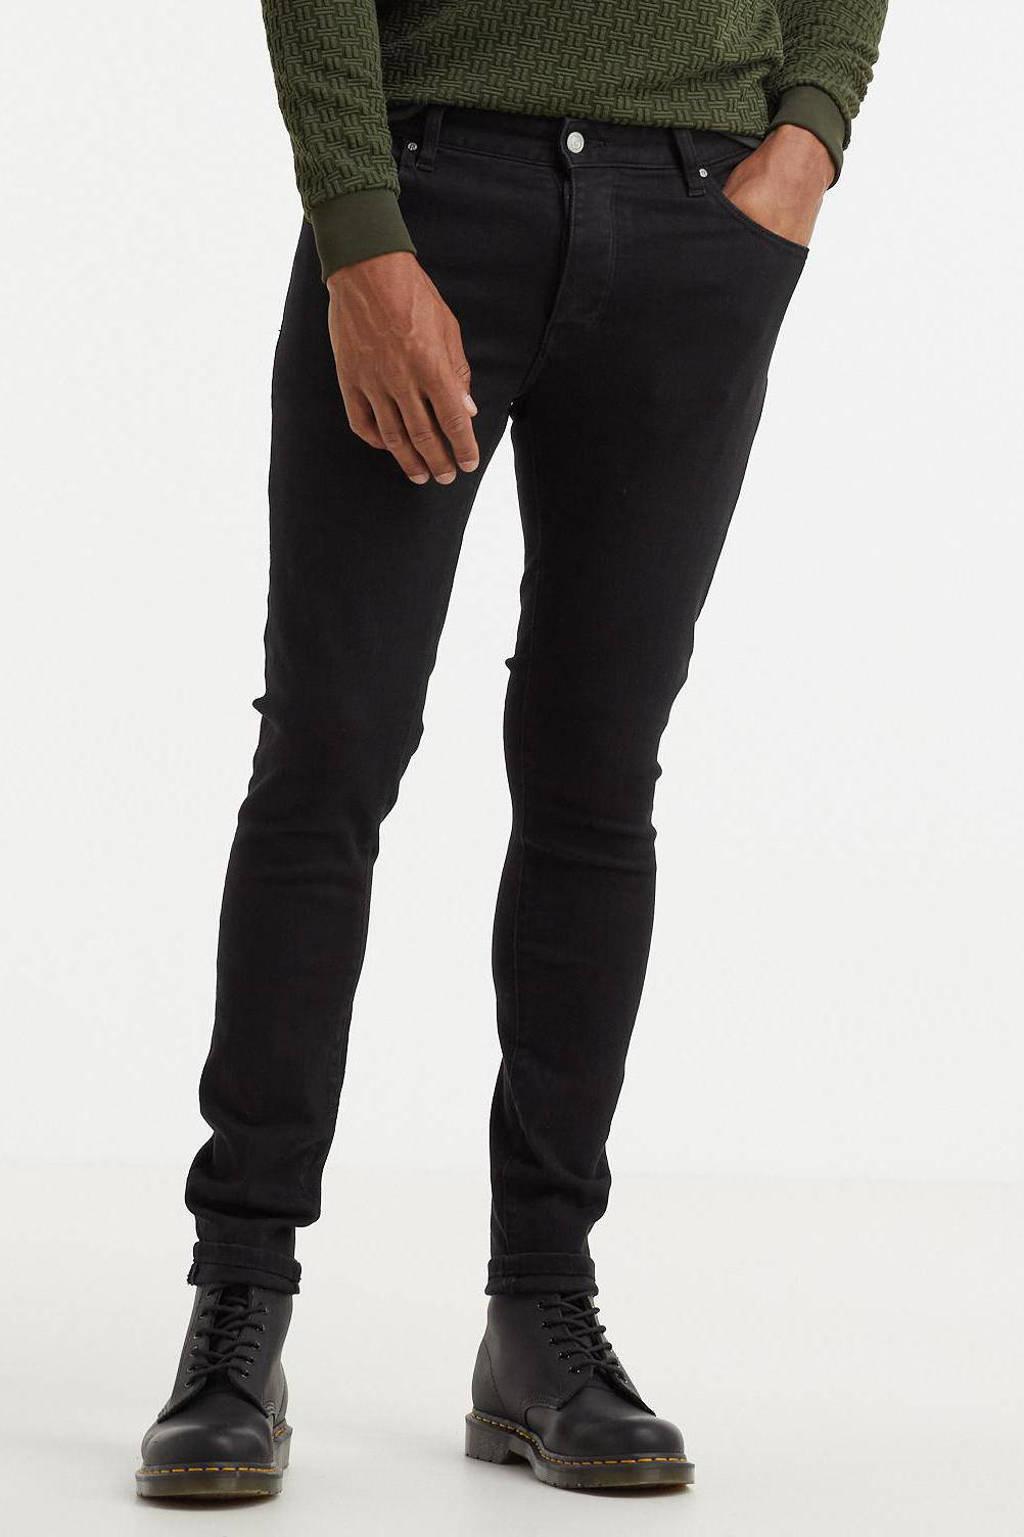 Raizzed super skinny jeans Jungle 04 black, 04 Black